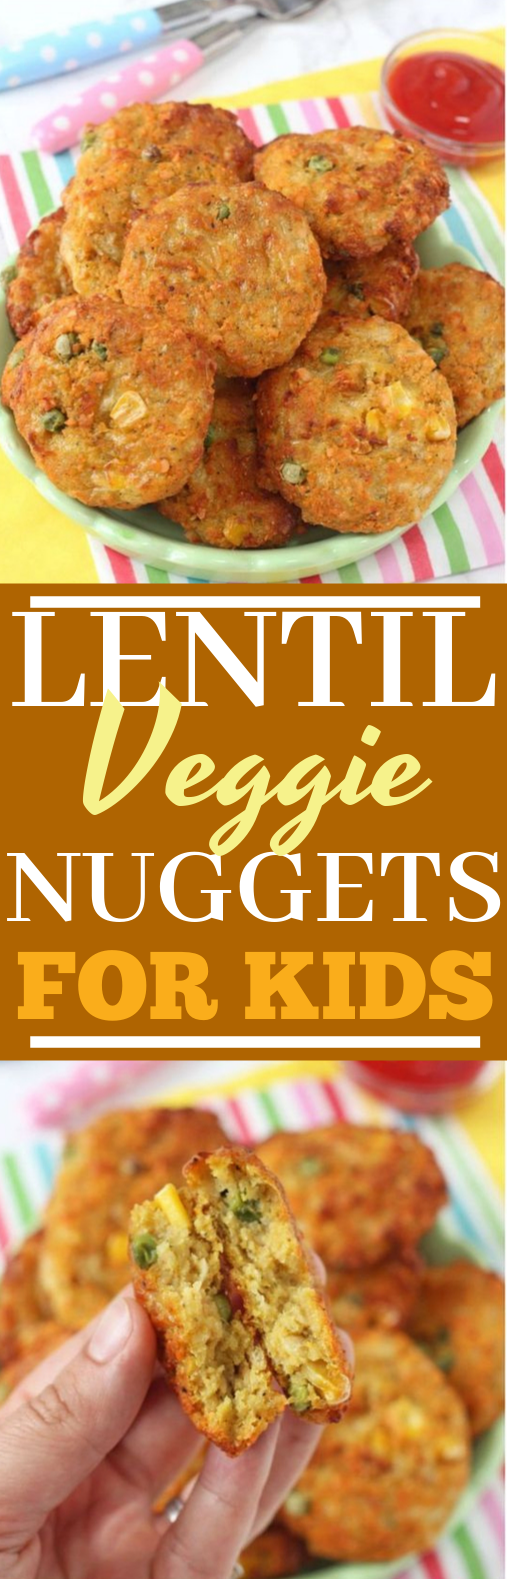 Lentil Veggie Nuggets #vegan #veggies